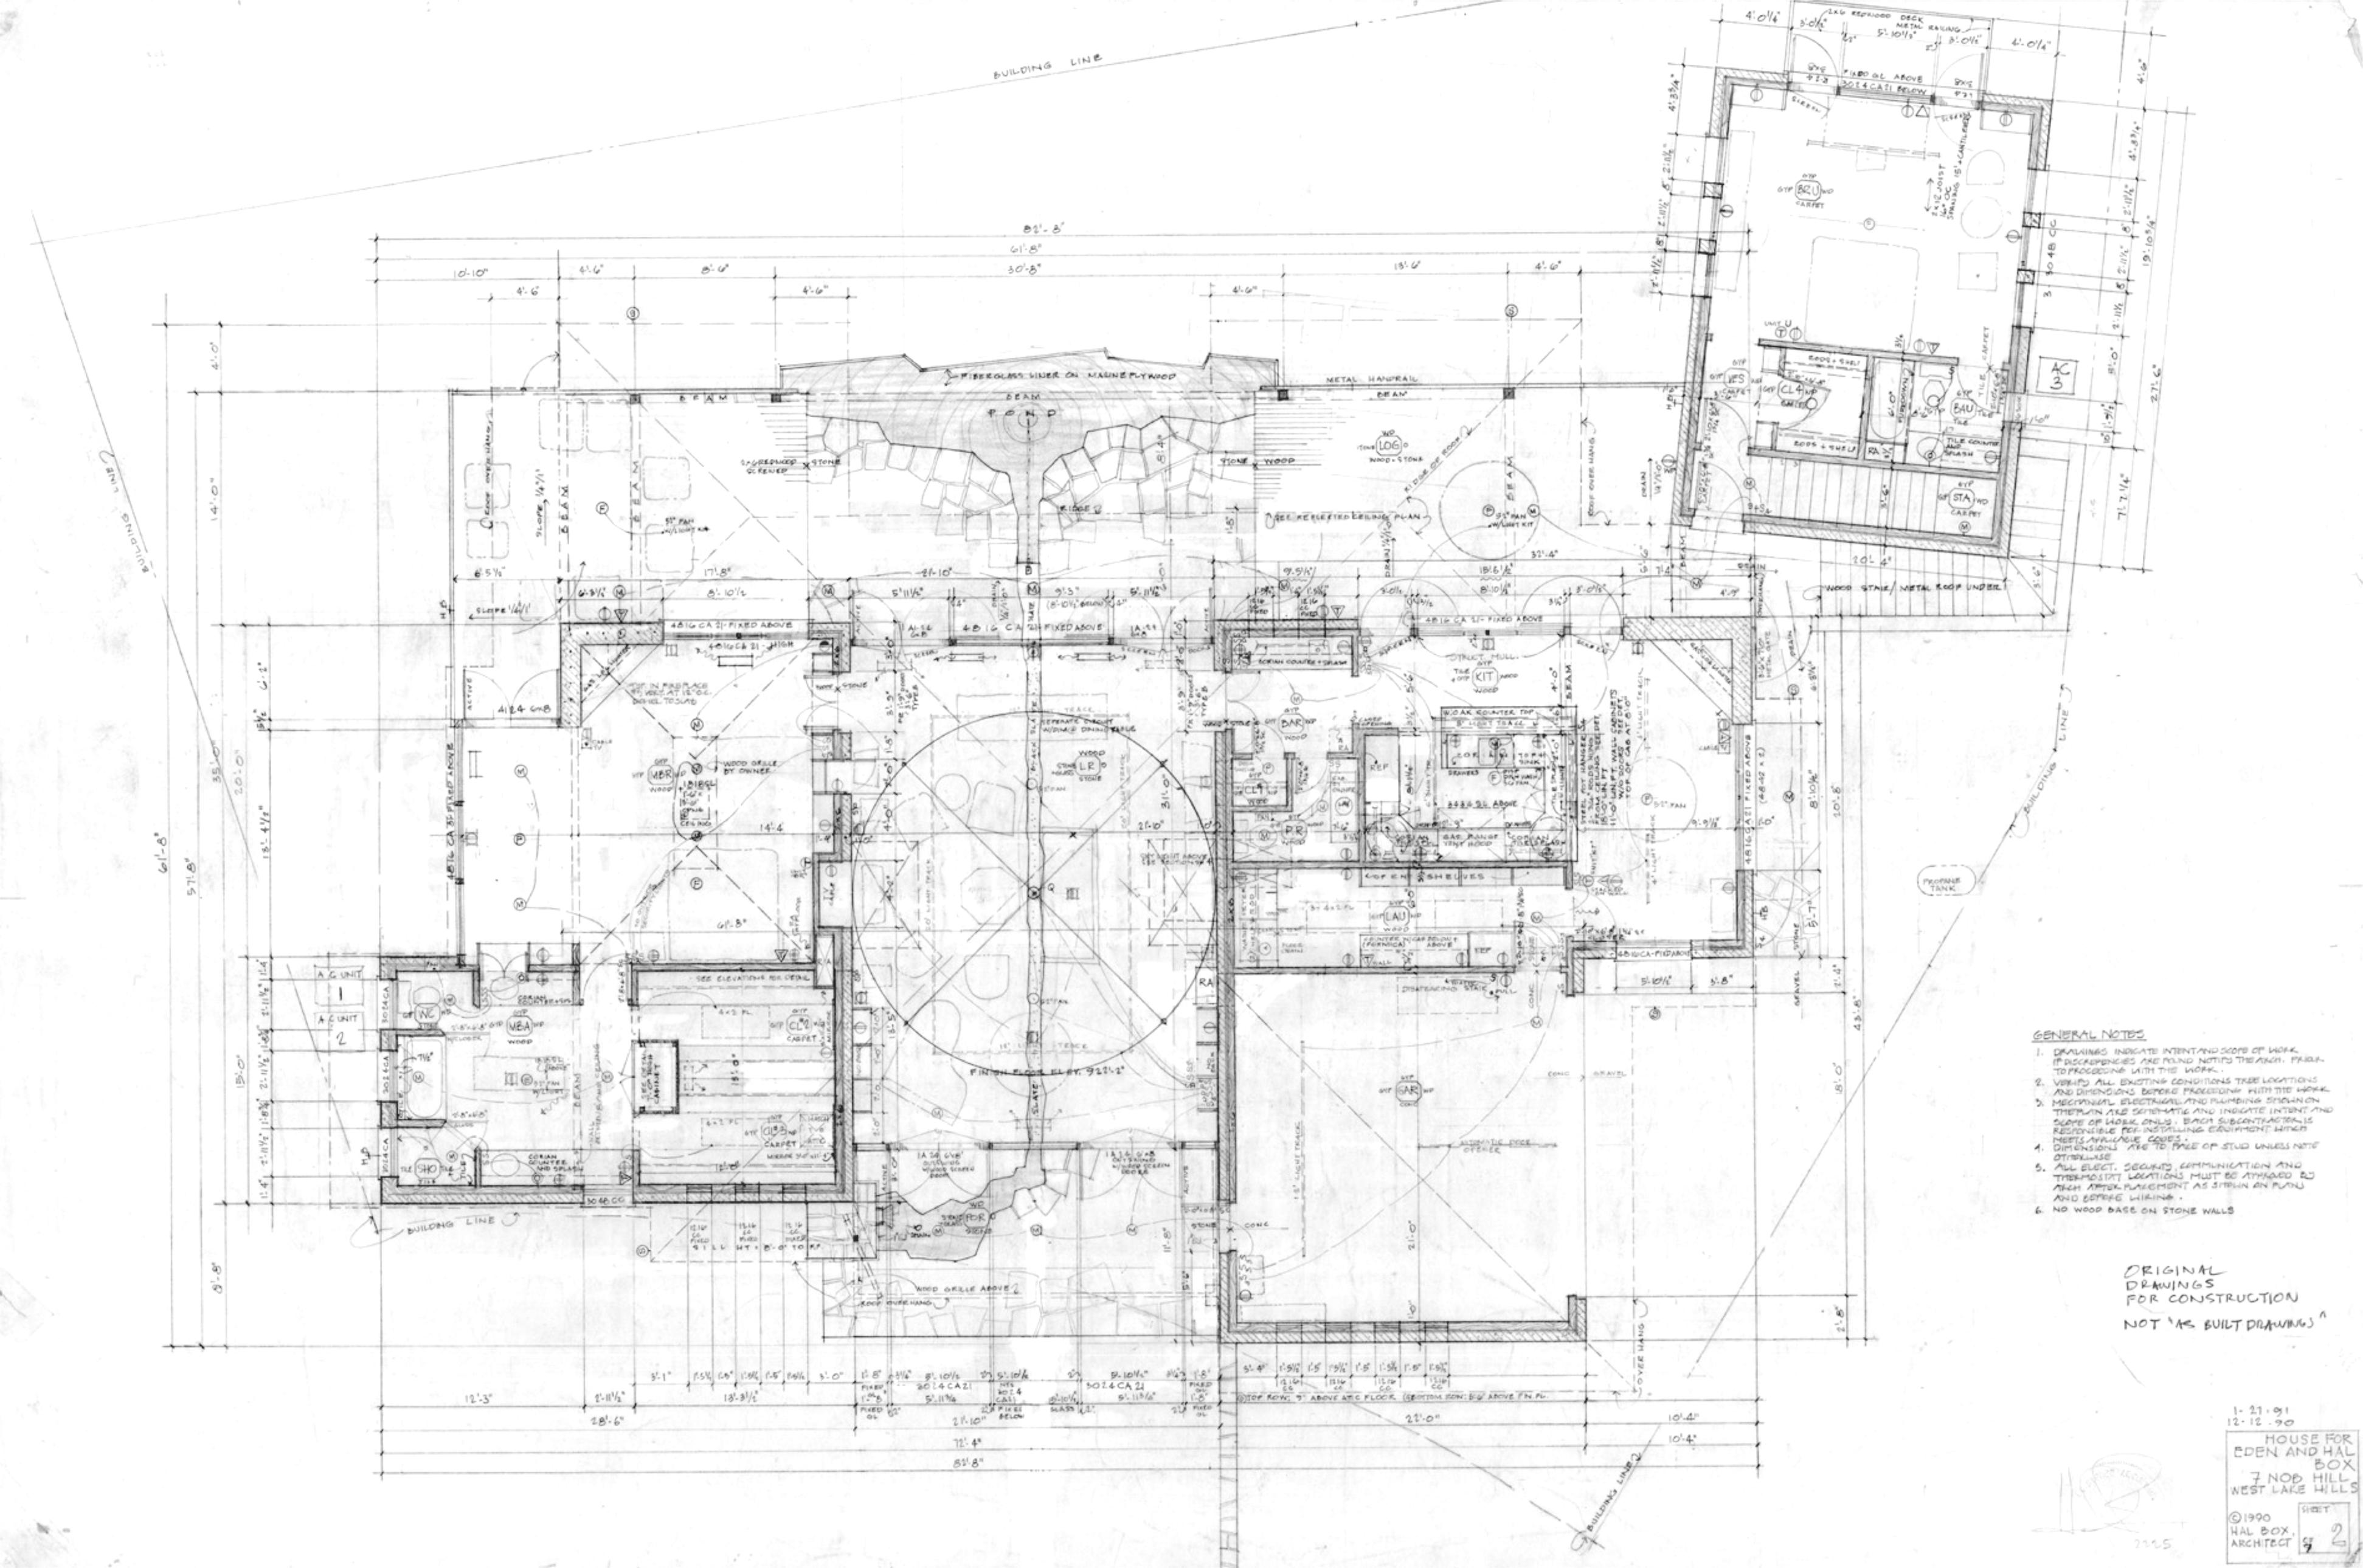 Рабочие чертежи автора Дома на Ноб-Хилл, 1991